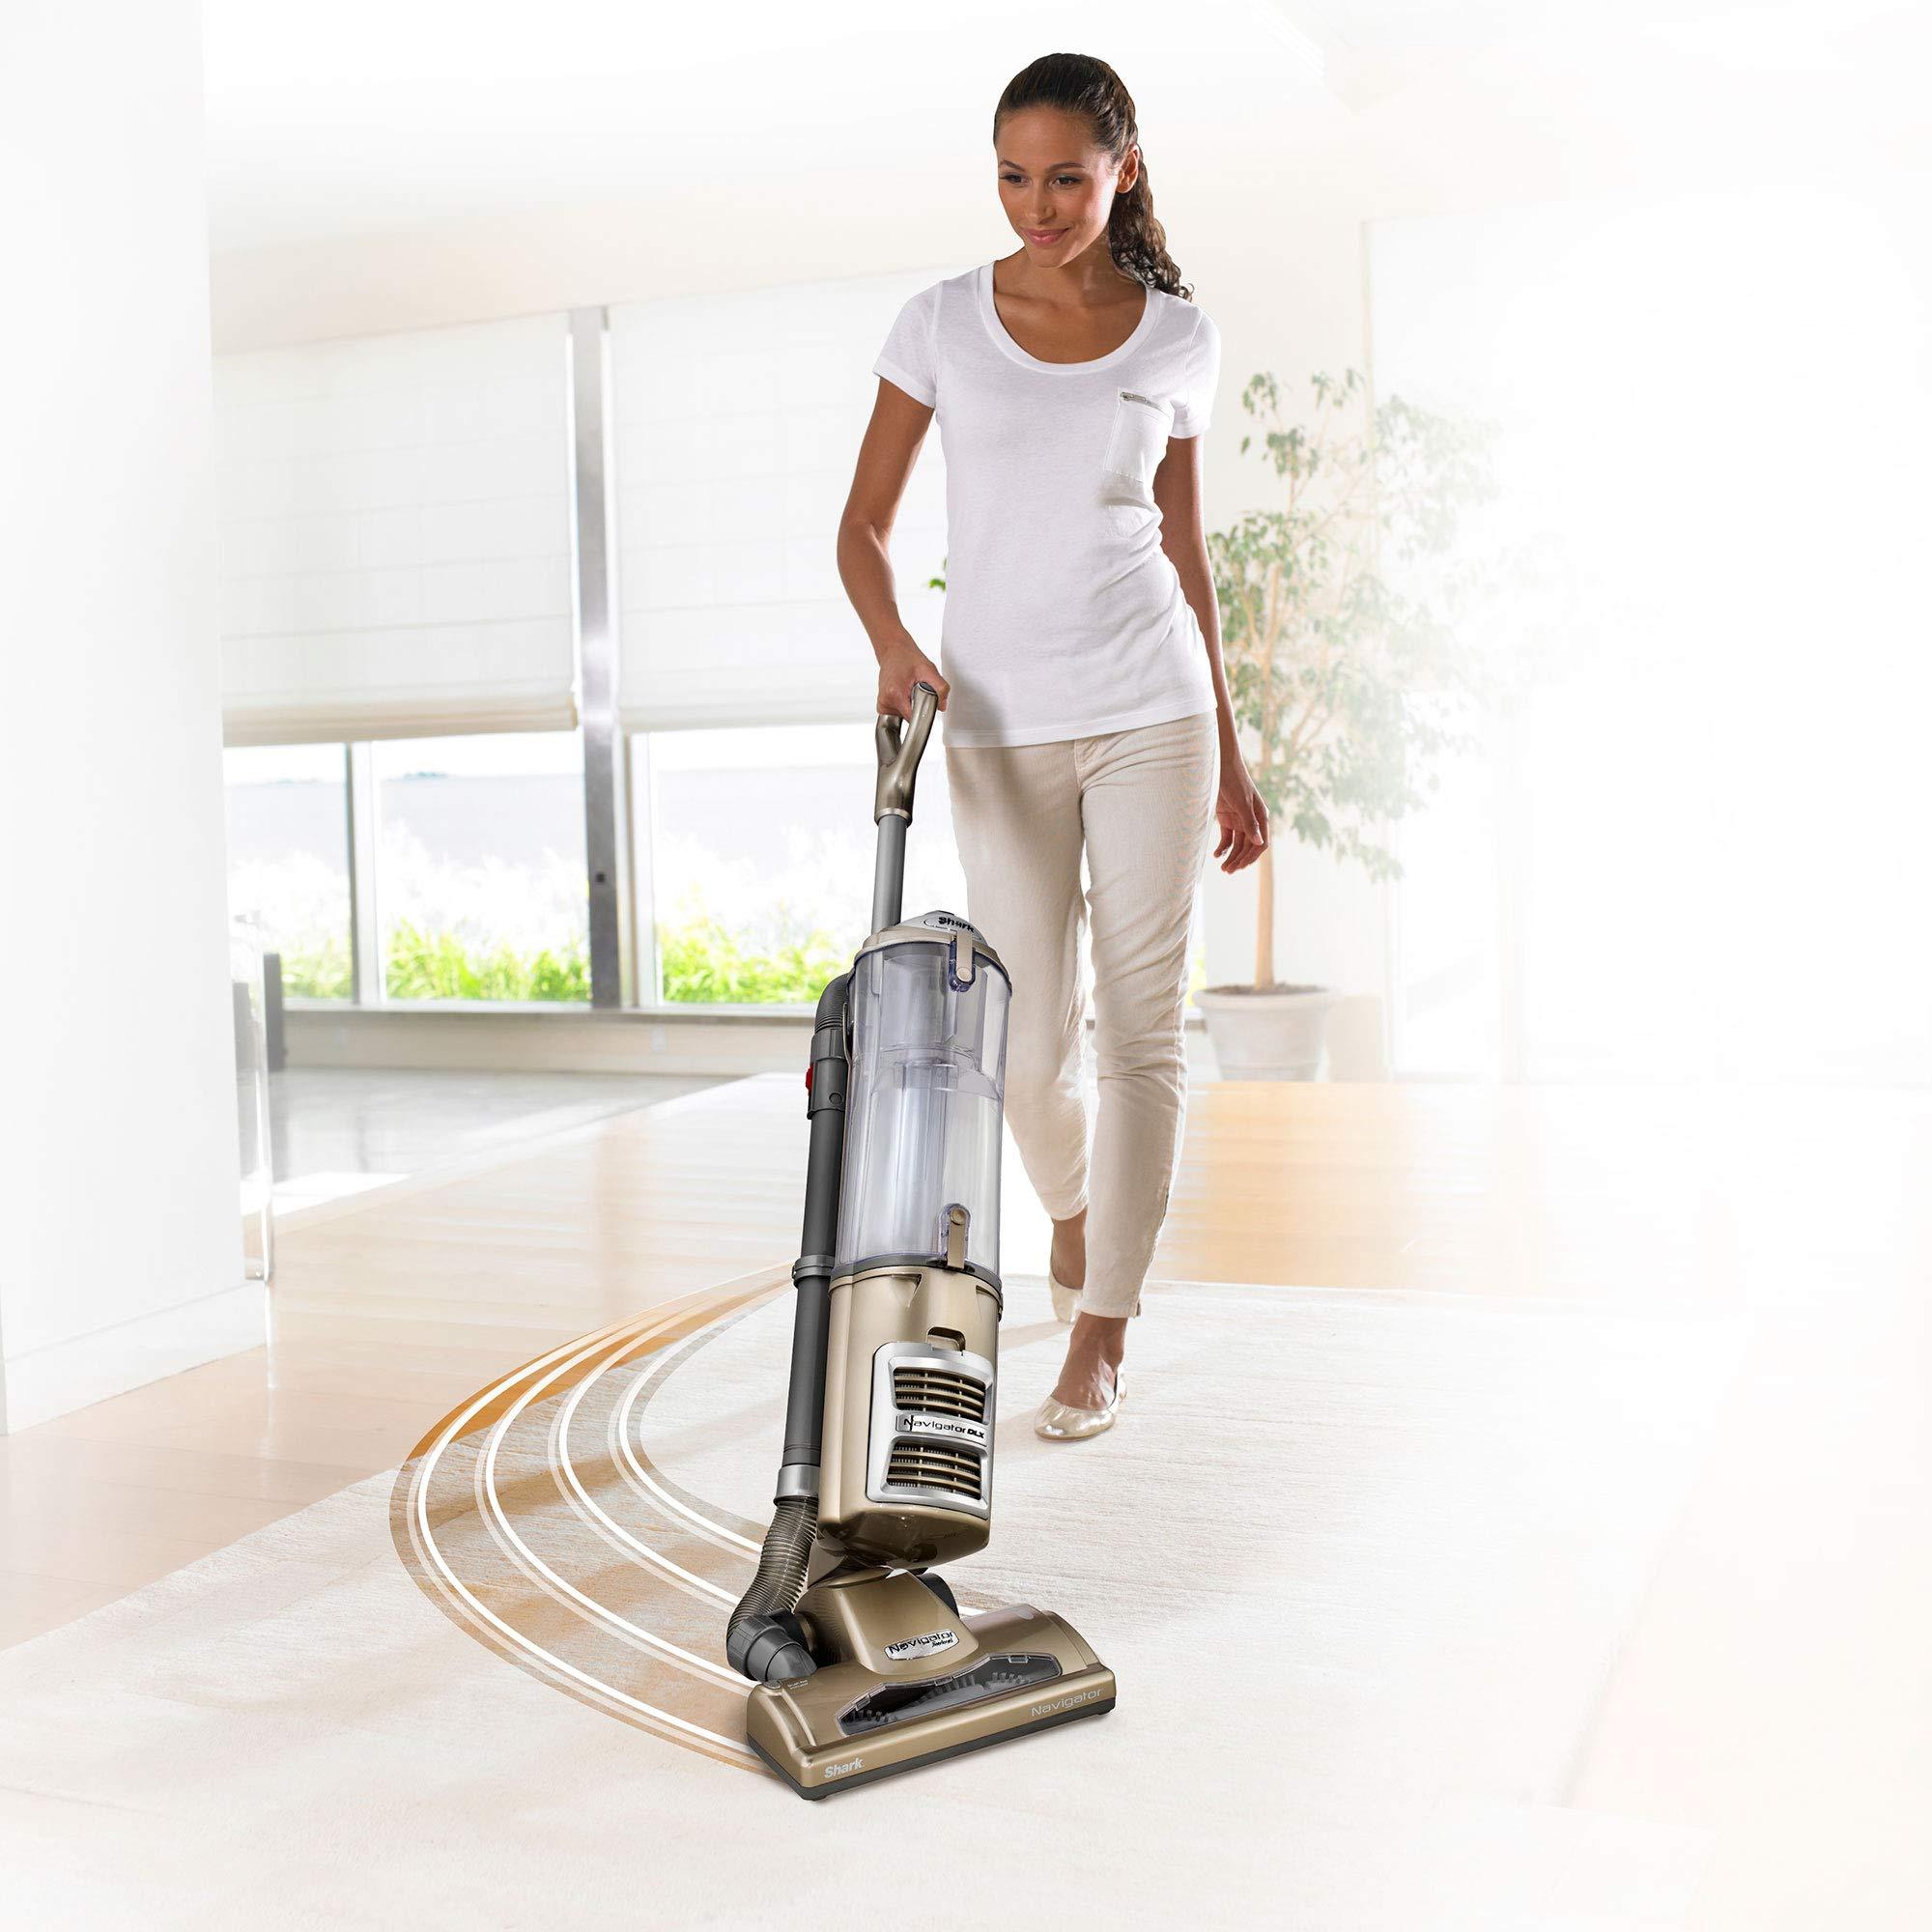 Shark NV70 Navigator Professional Upright Vacuum, Gold by Shark (Image #6)